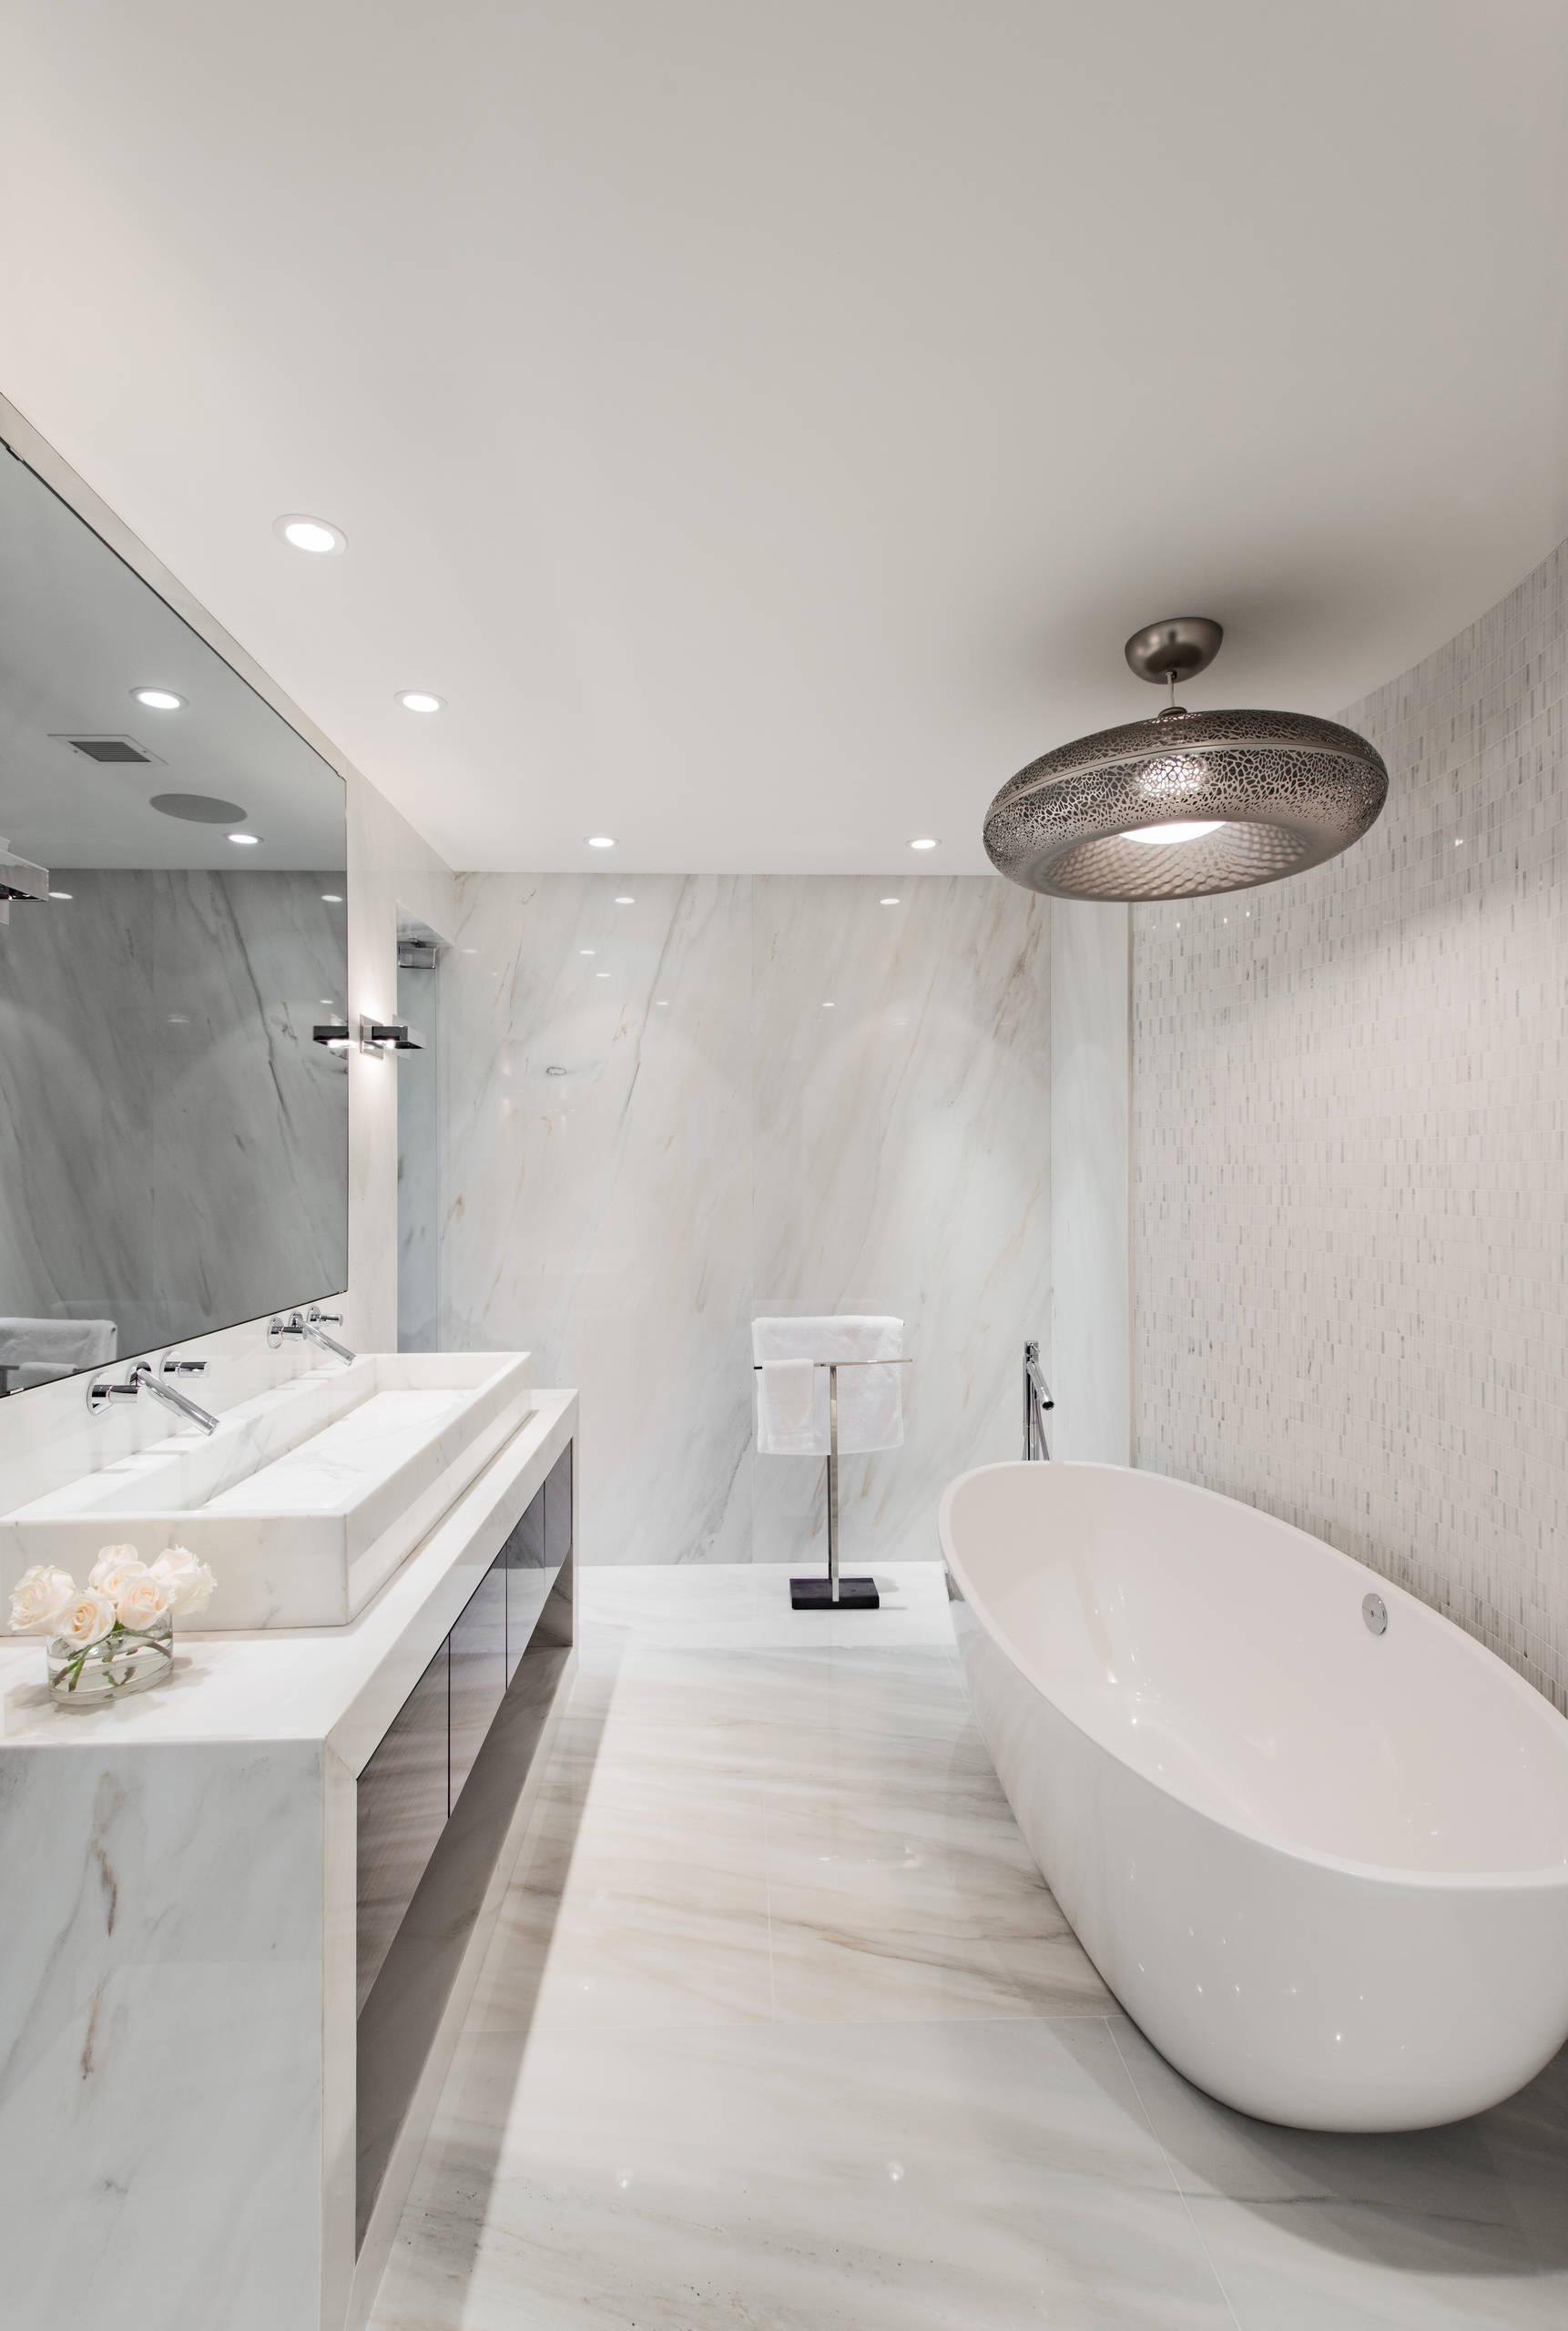 Waterfall Vanity Houzz, Waterfall Bathroom Vanity